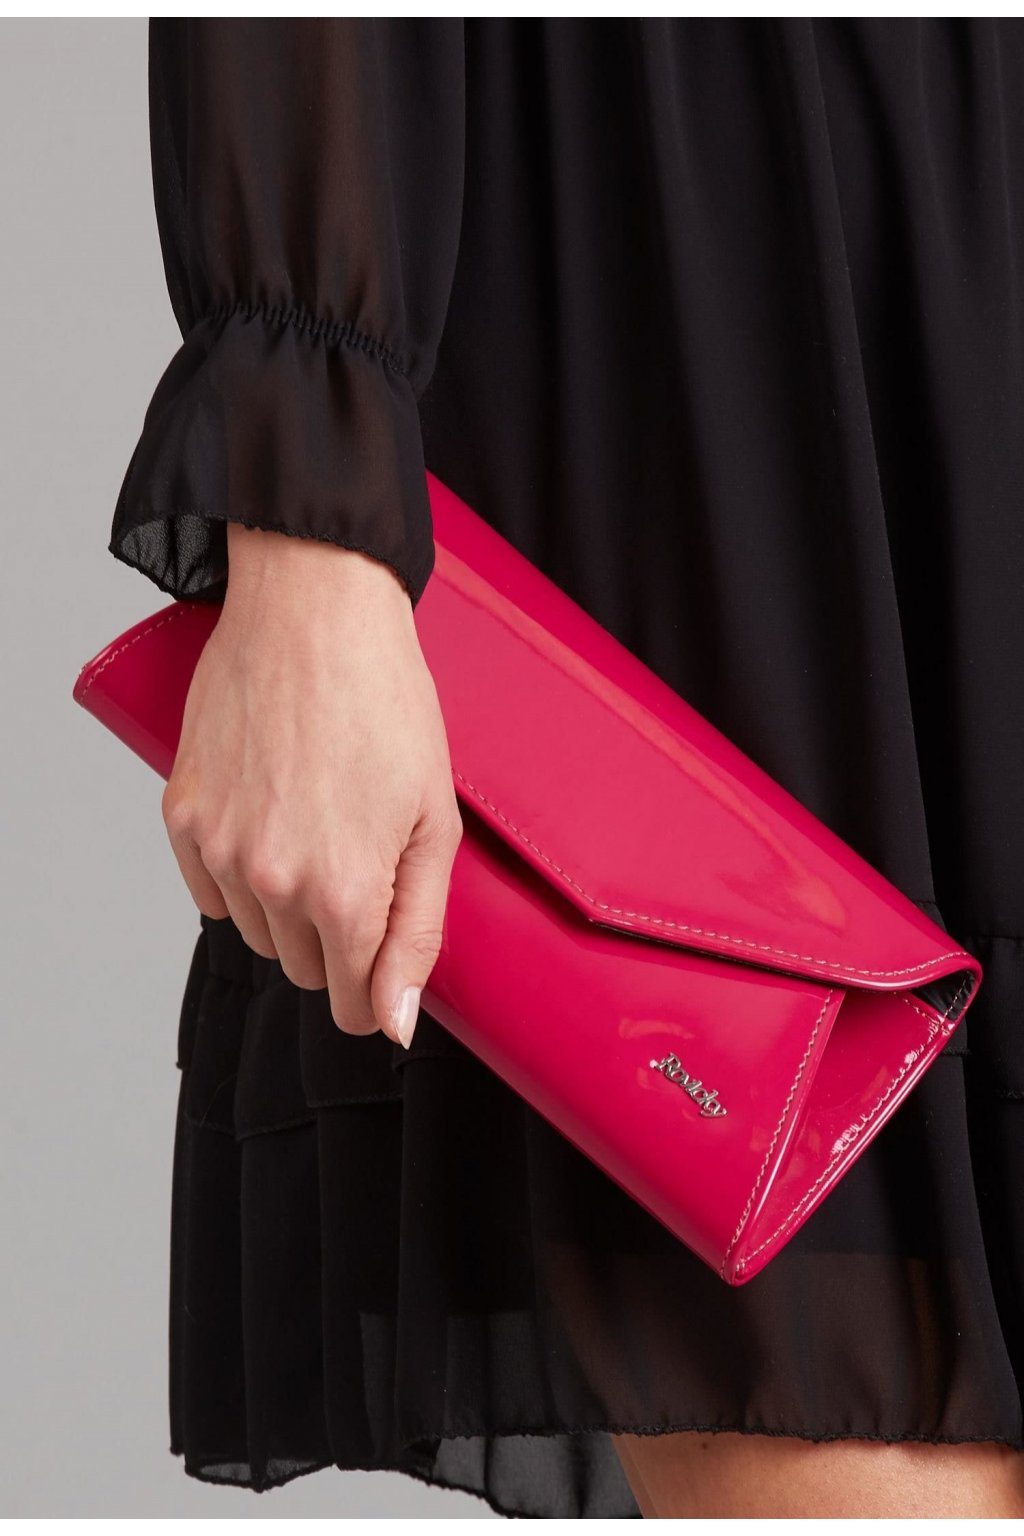 Fuchsiová dámska listová kabelka